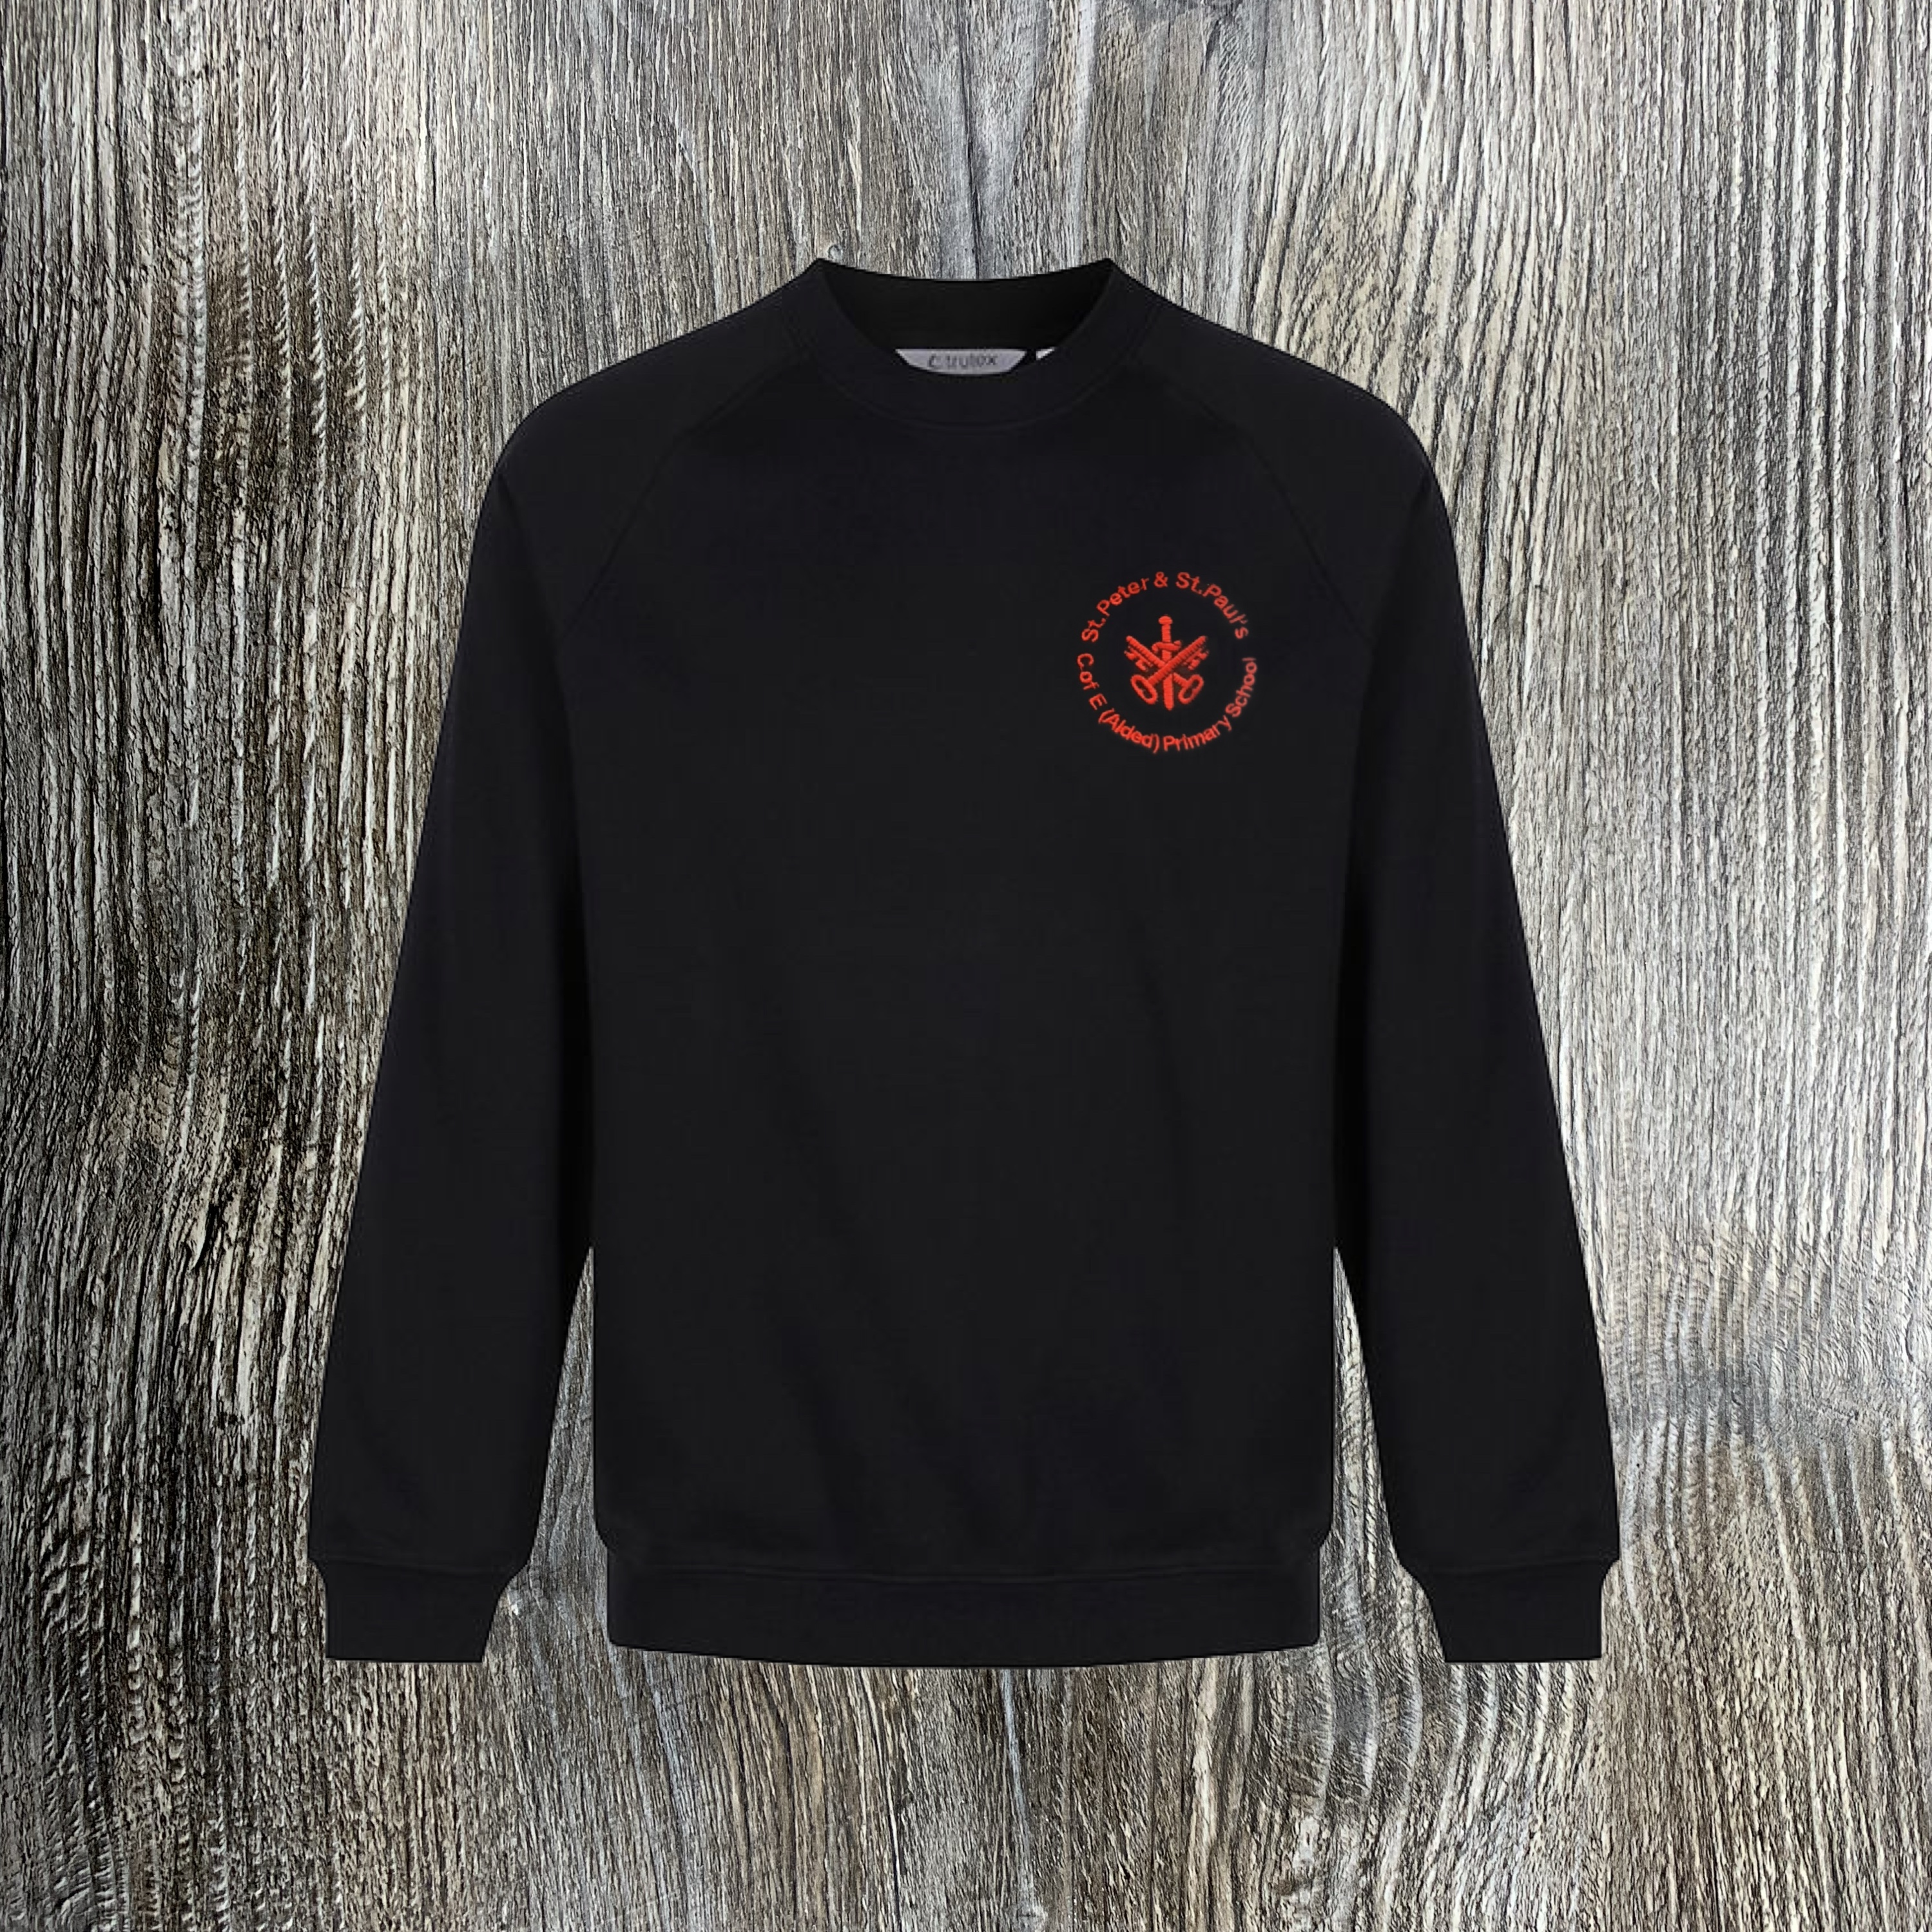 St Peter & St Paul's Sweatshirt